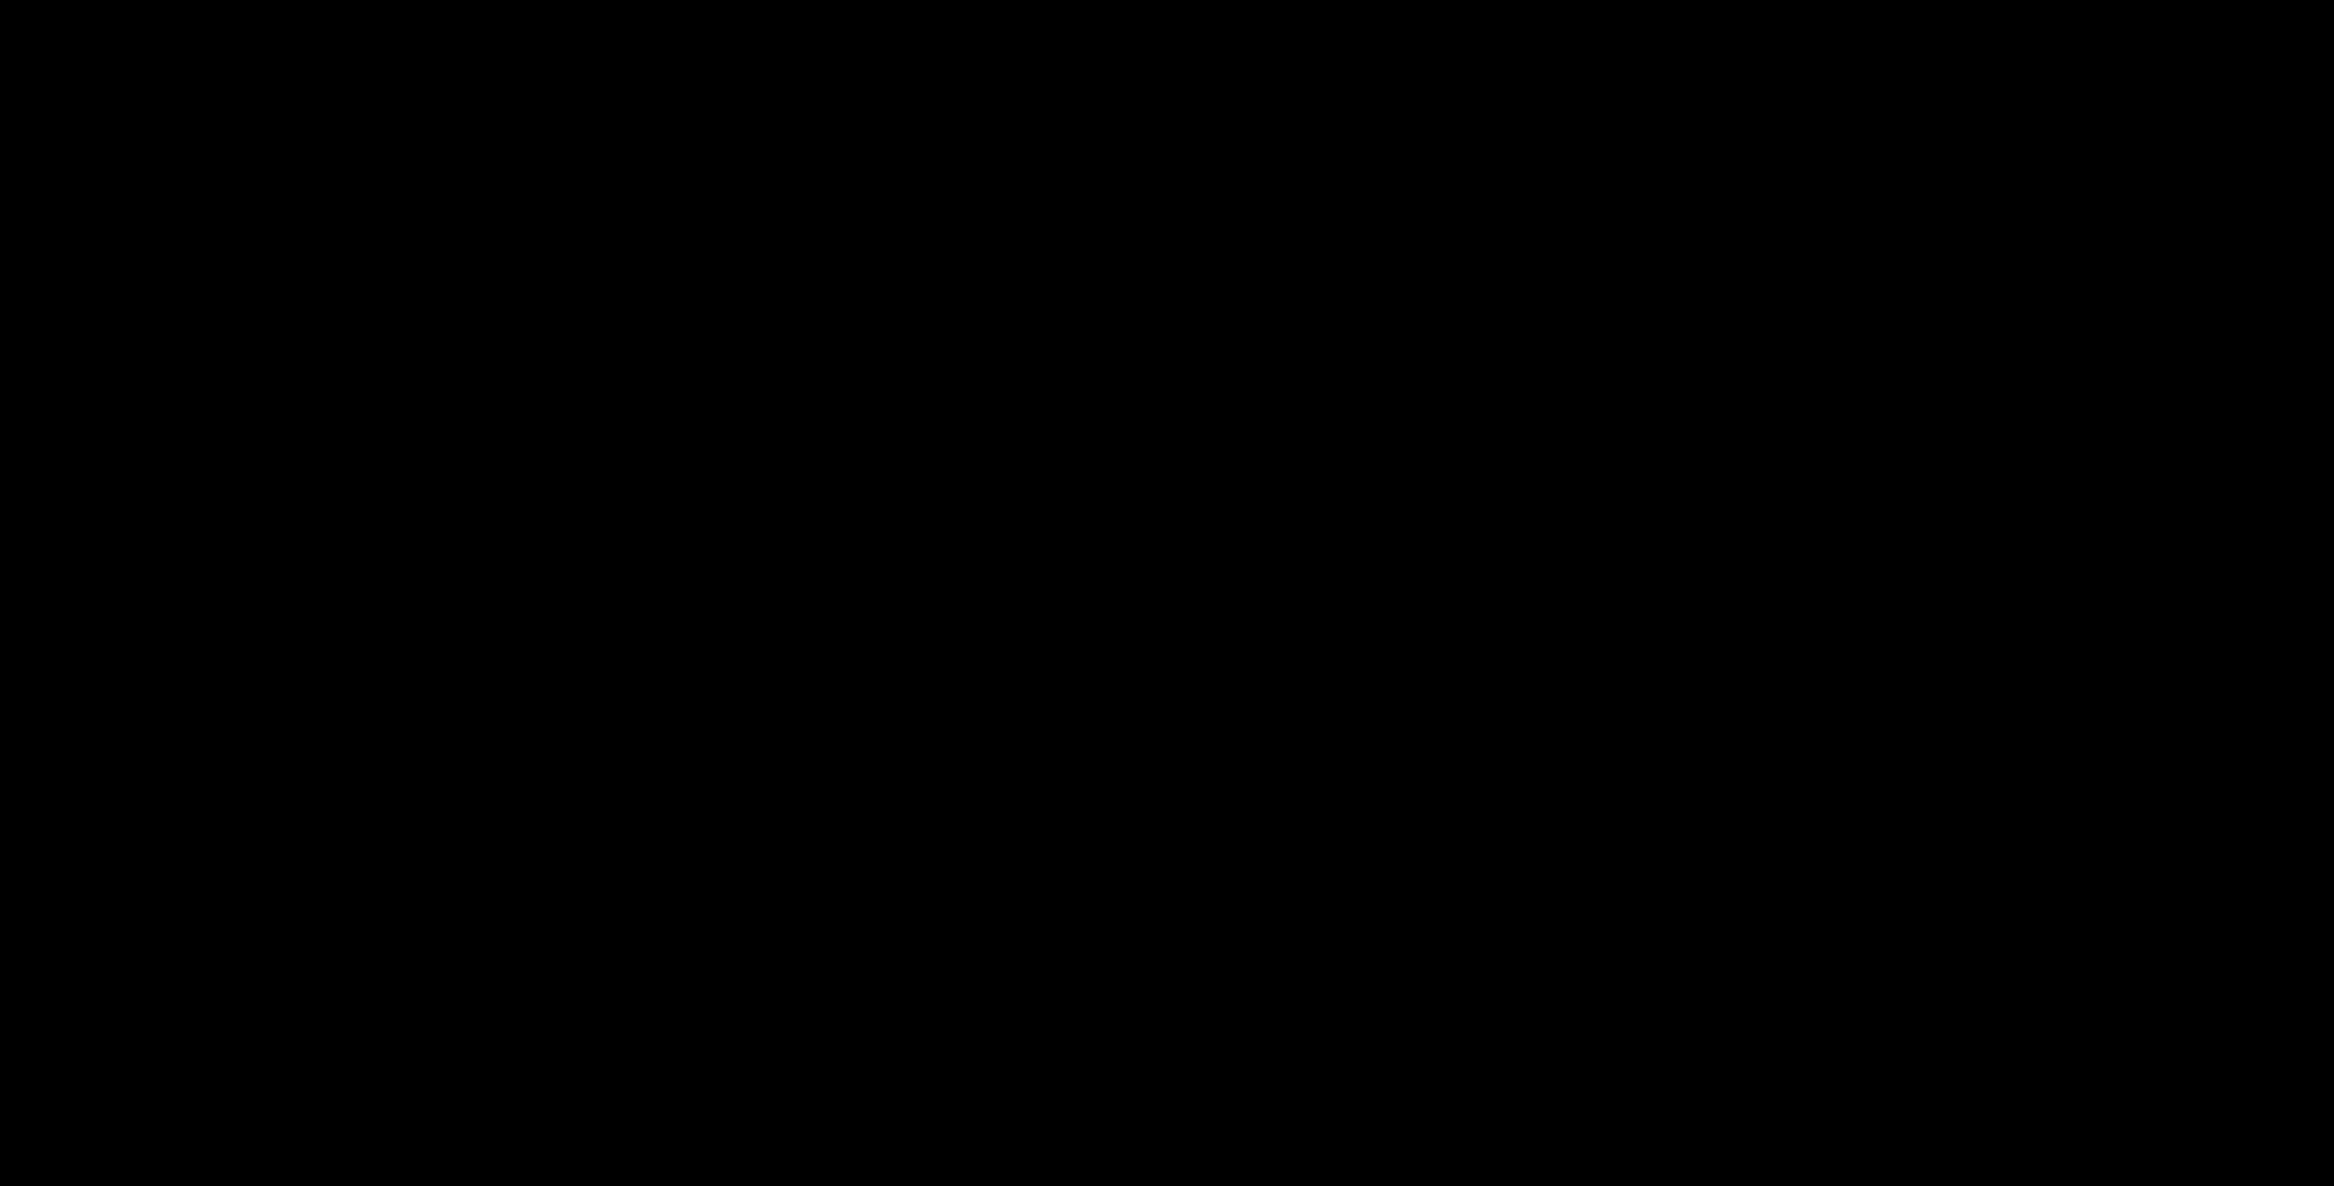 Pointer finger clipart transparent background jontron